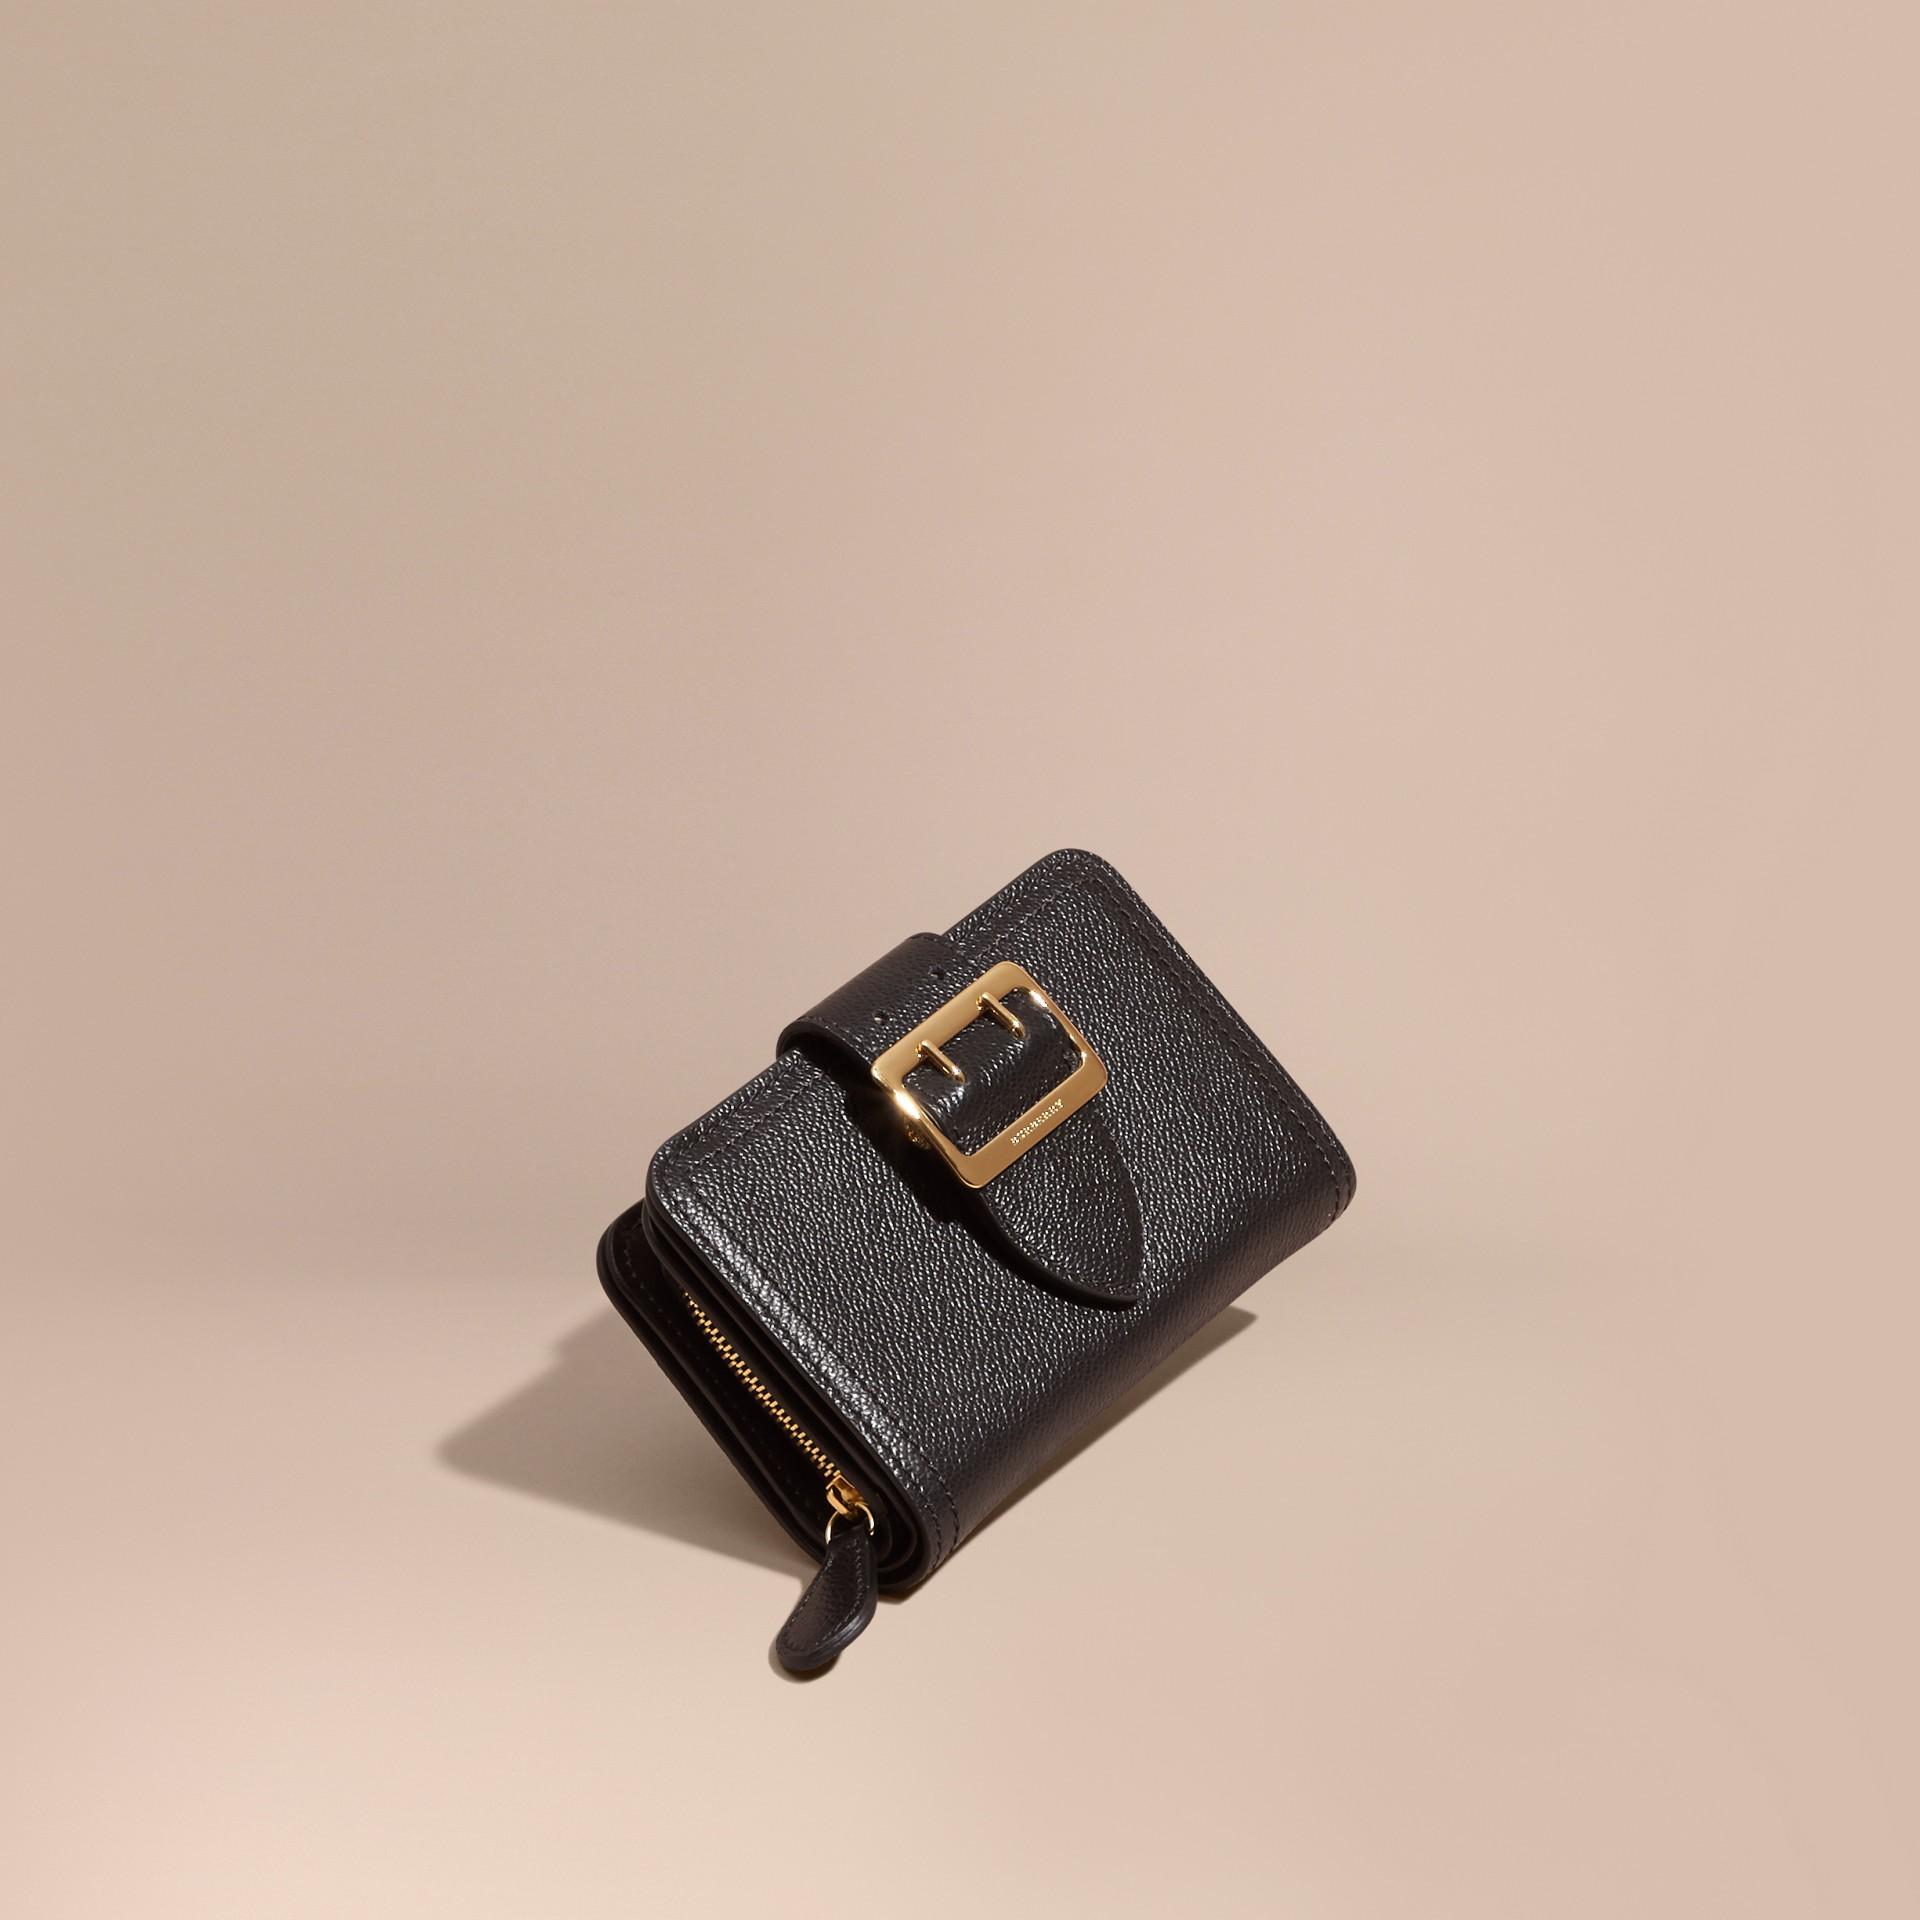 Black Buckle Detail Grainy Leather Wallet Black - gallery image 1